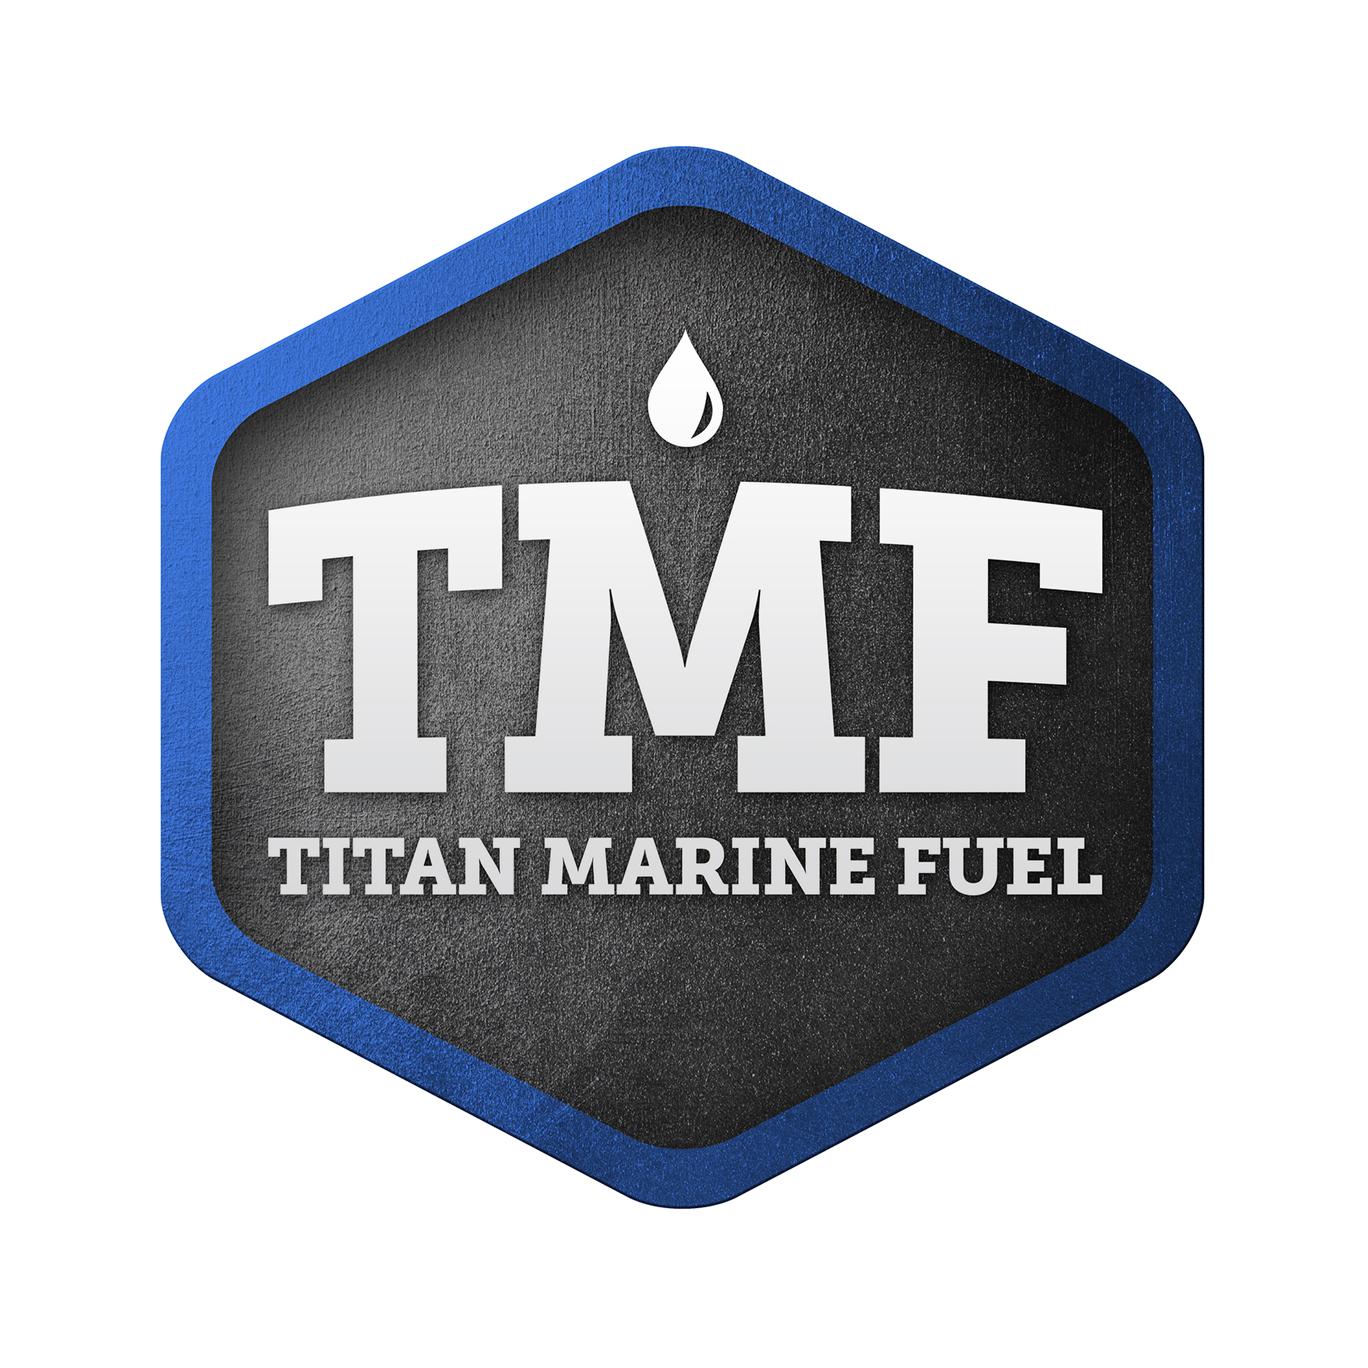 Titan Marine Fueling logo